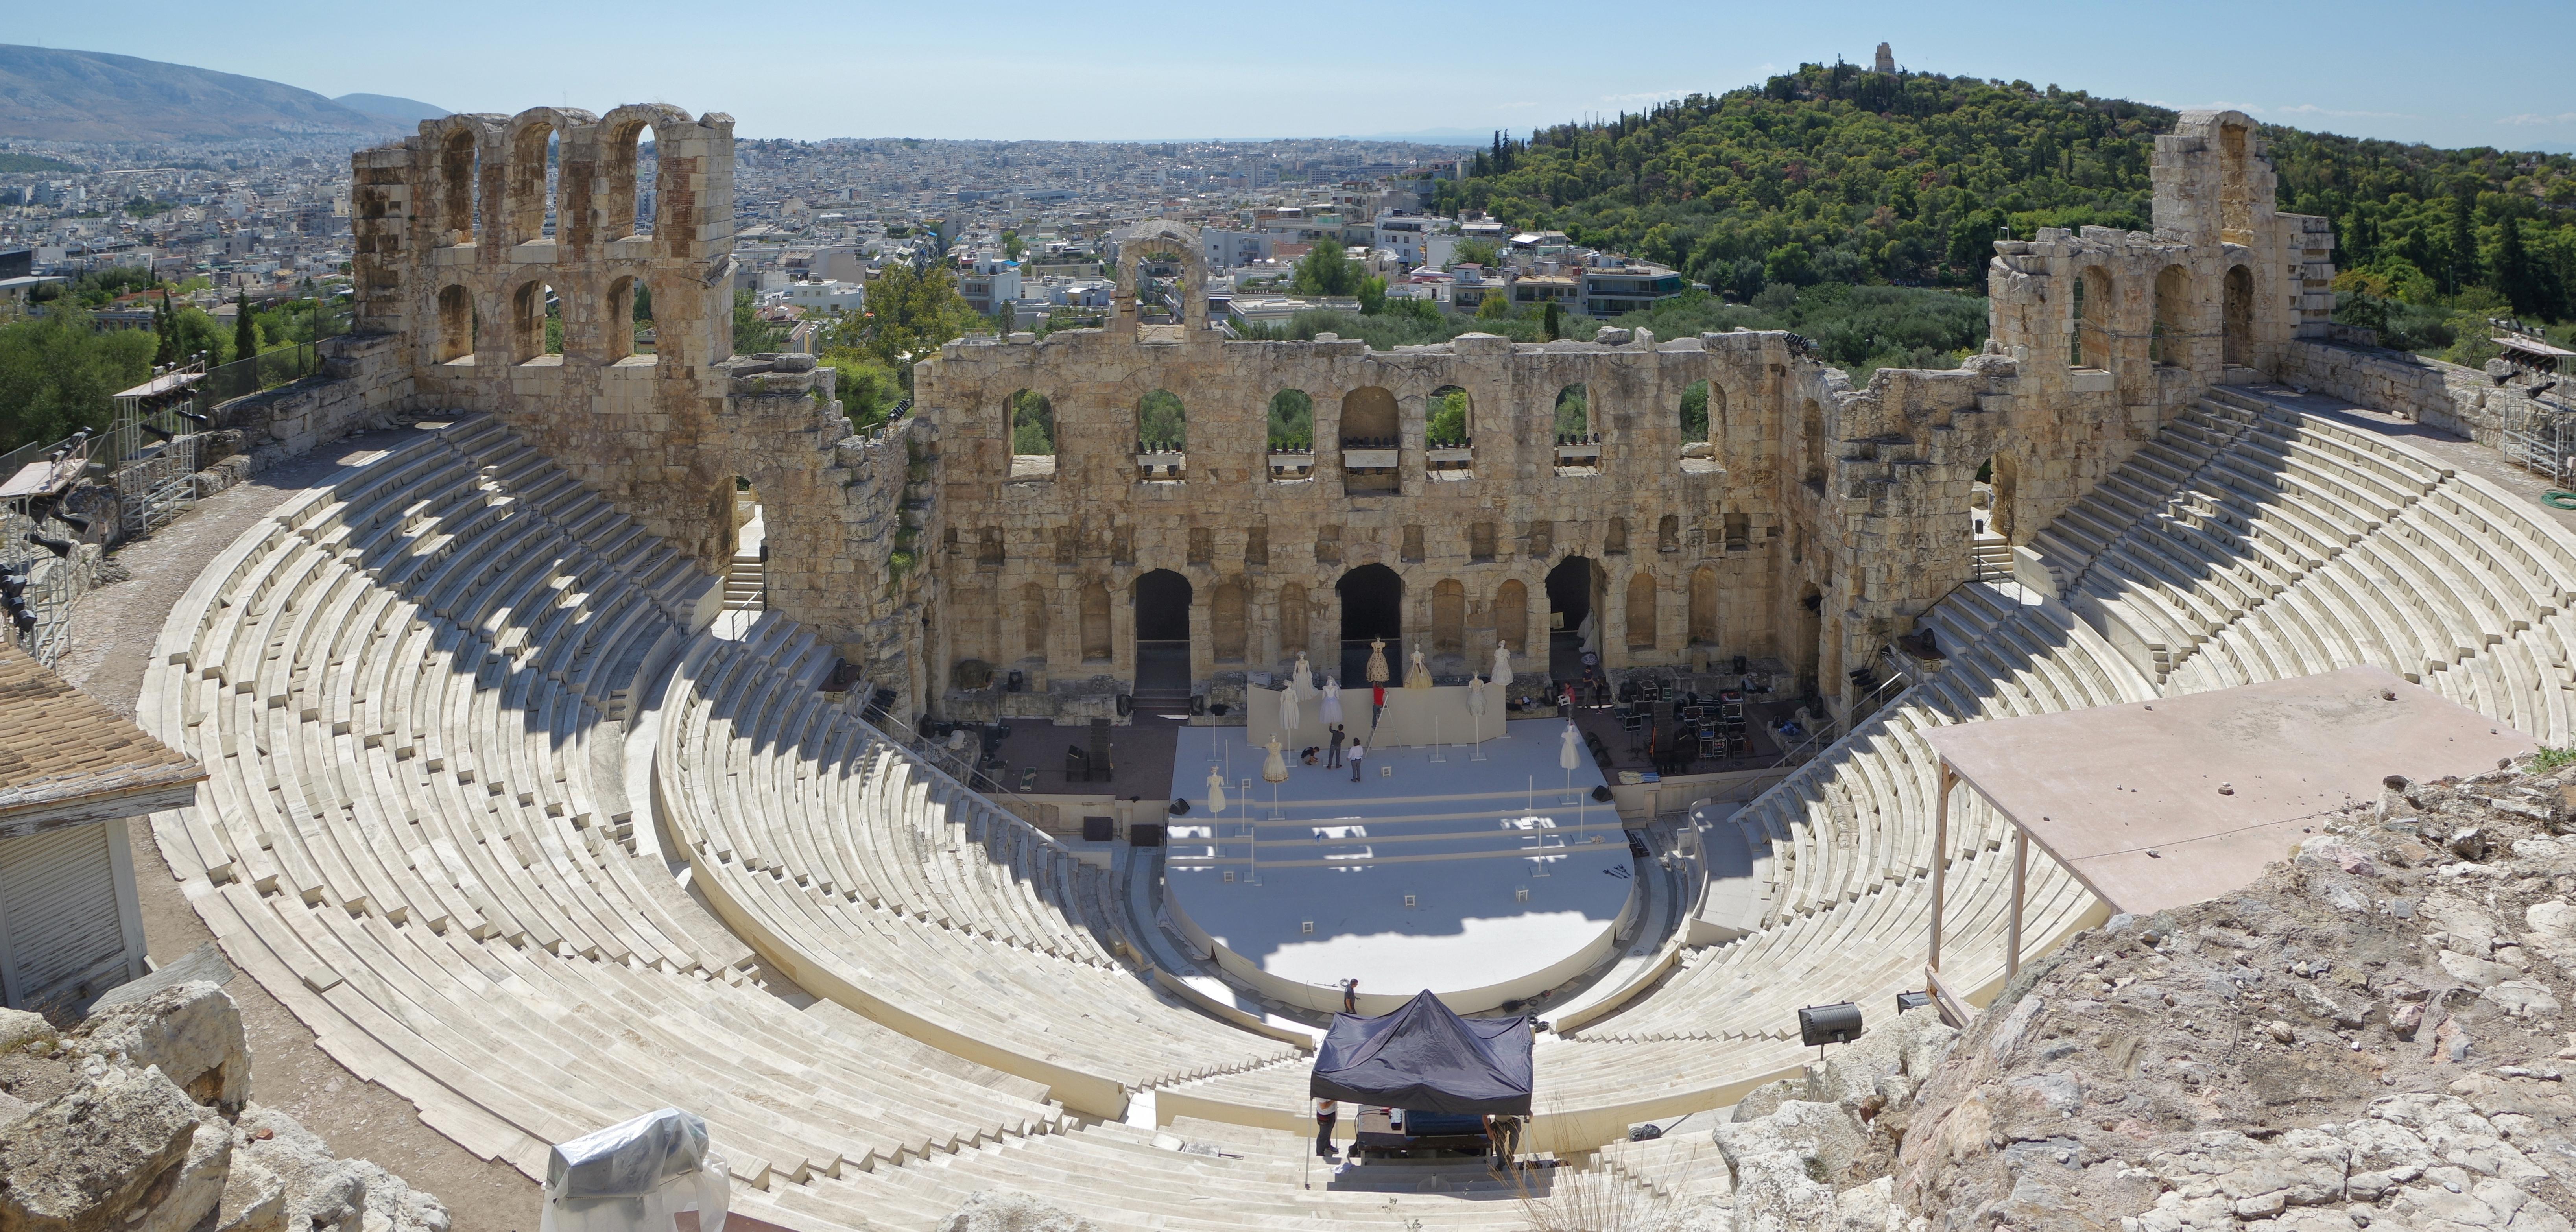 Athen_Odeon_Herodes_Atticus_BW_2017-10-09_13-12-44